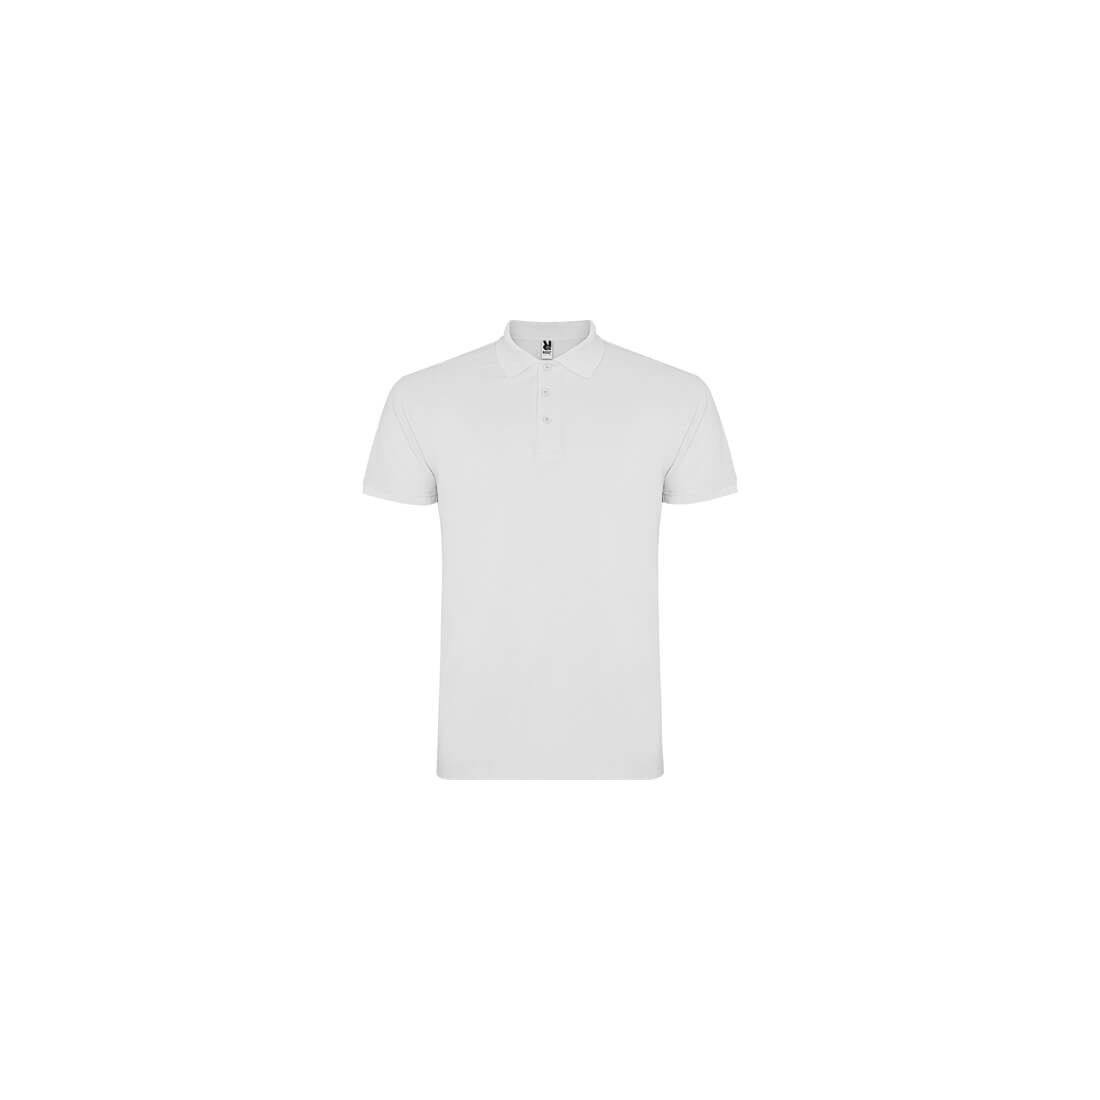 Polo blanco de manga corta